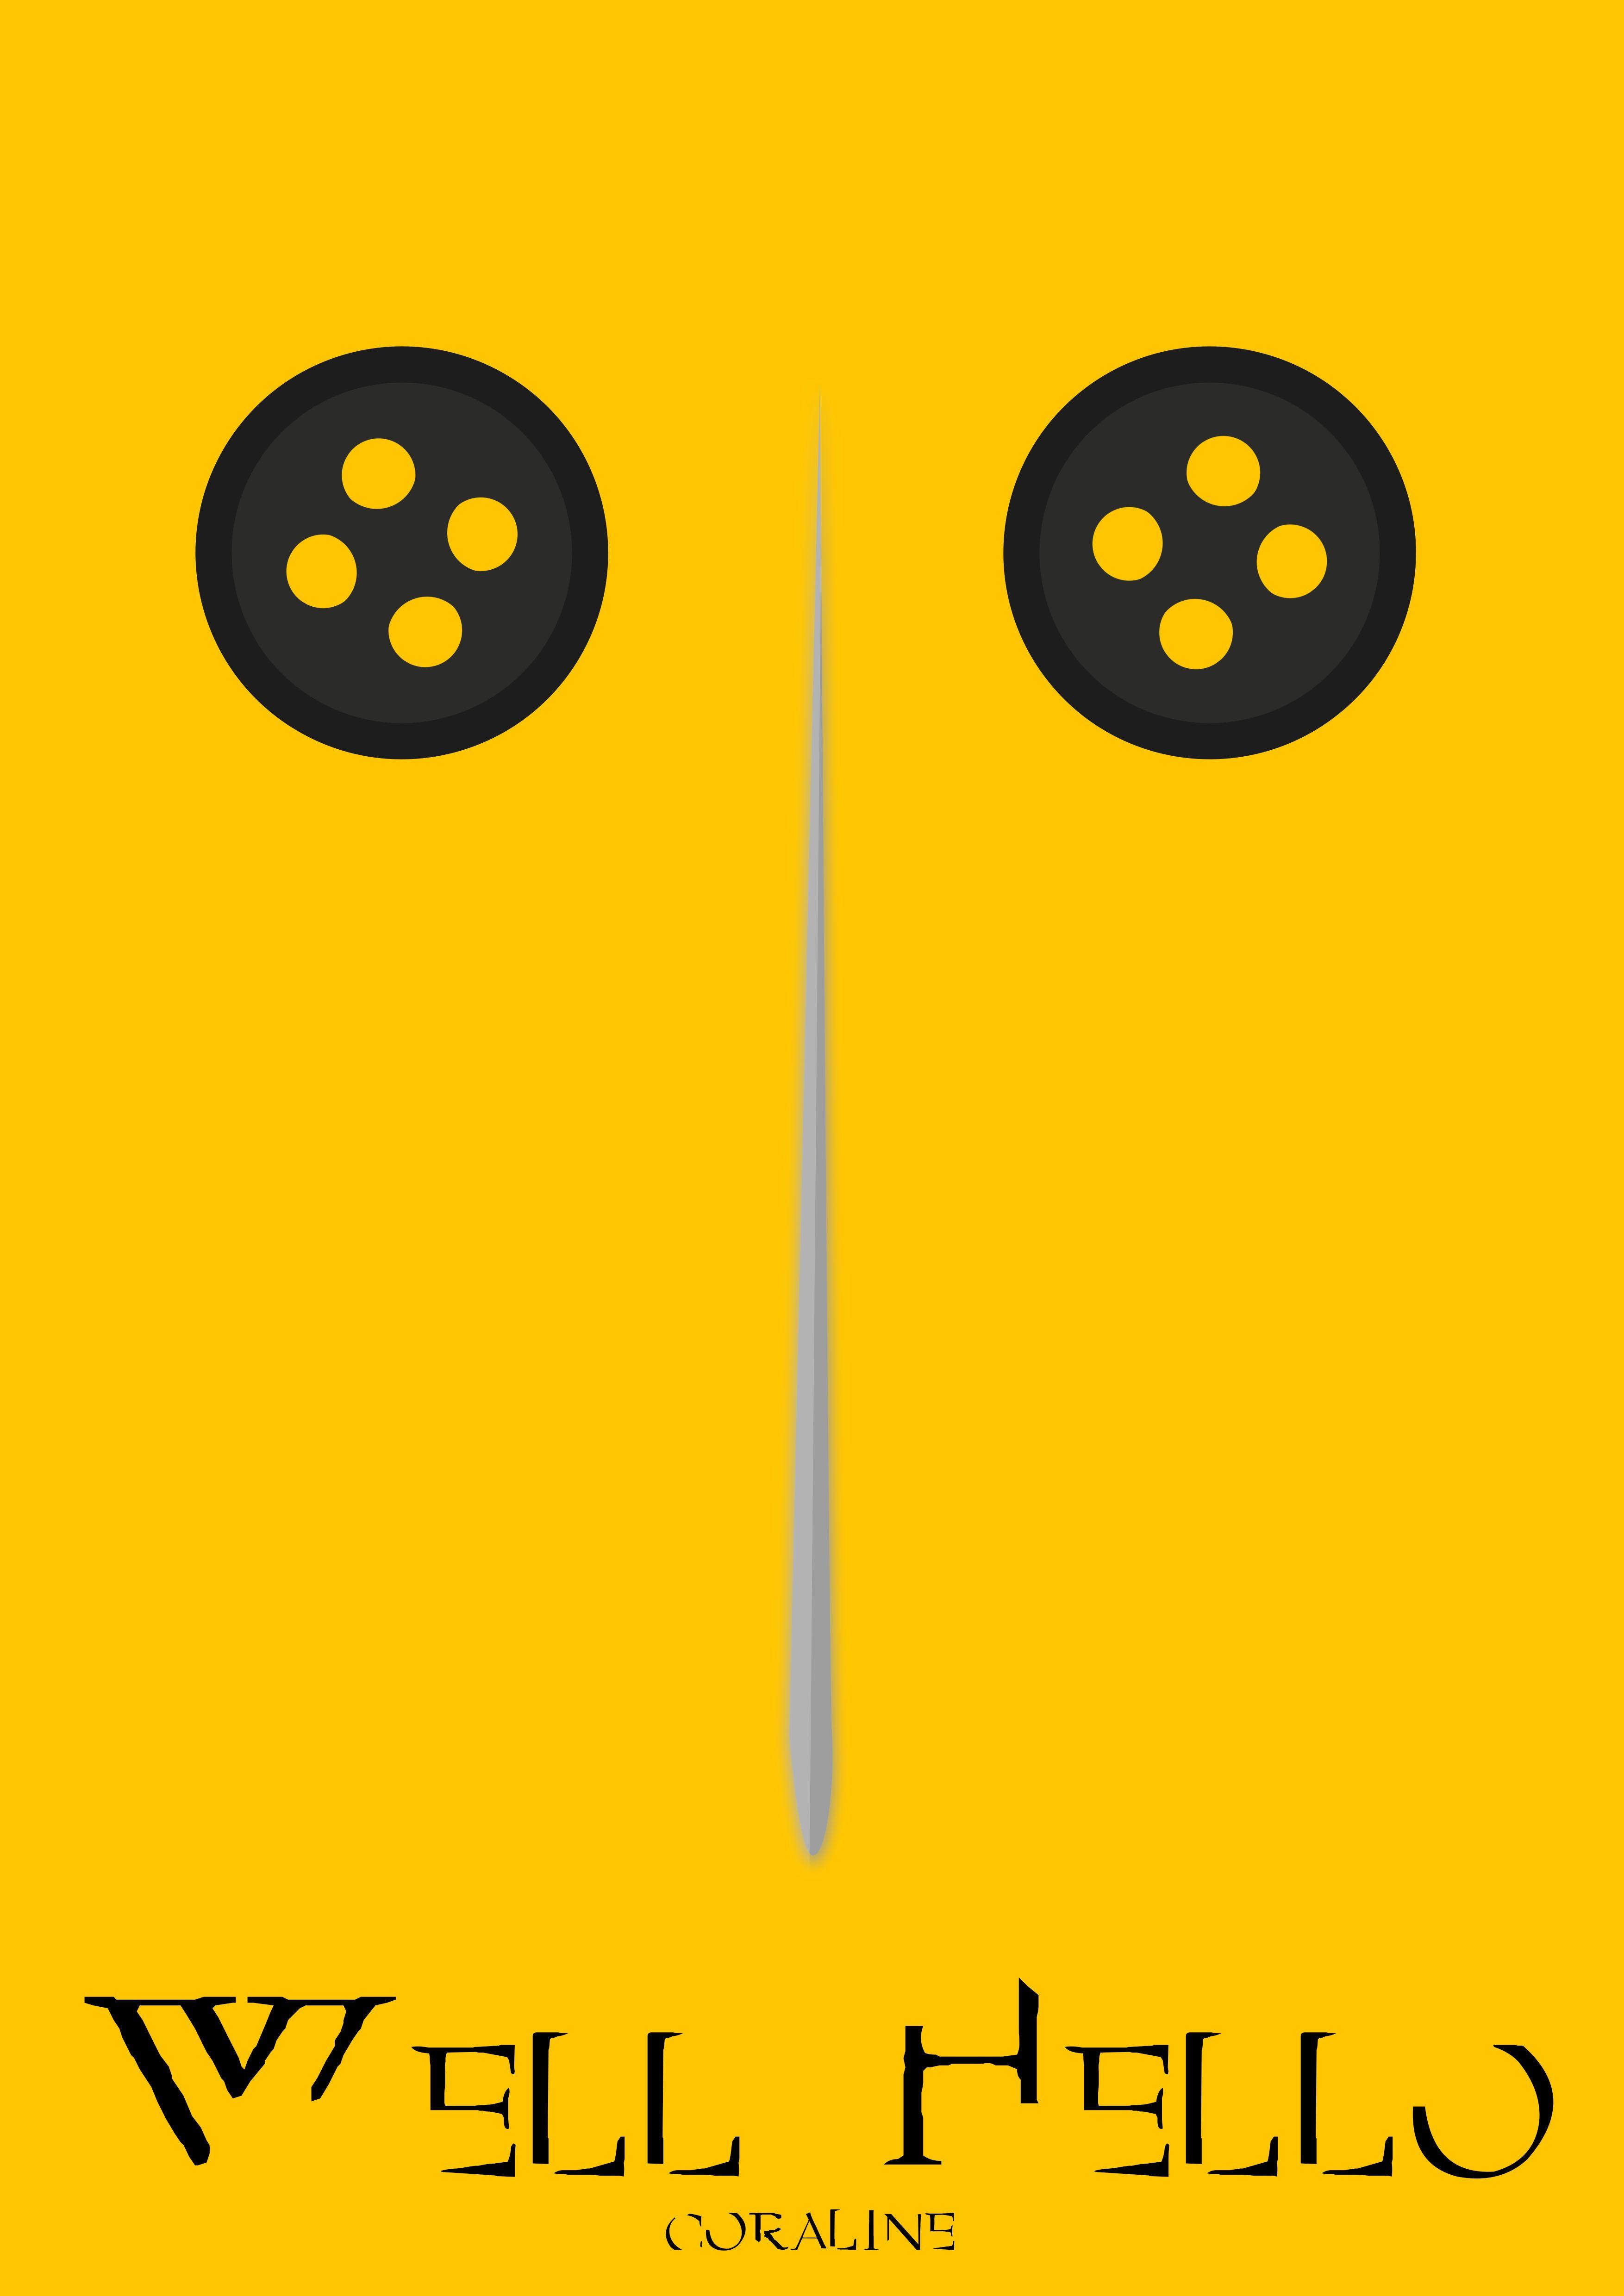 Well Hello Design Art Posterart Coraline Creepy Neilgaiman Horror Create Coraline Vector Estampado